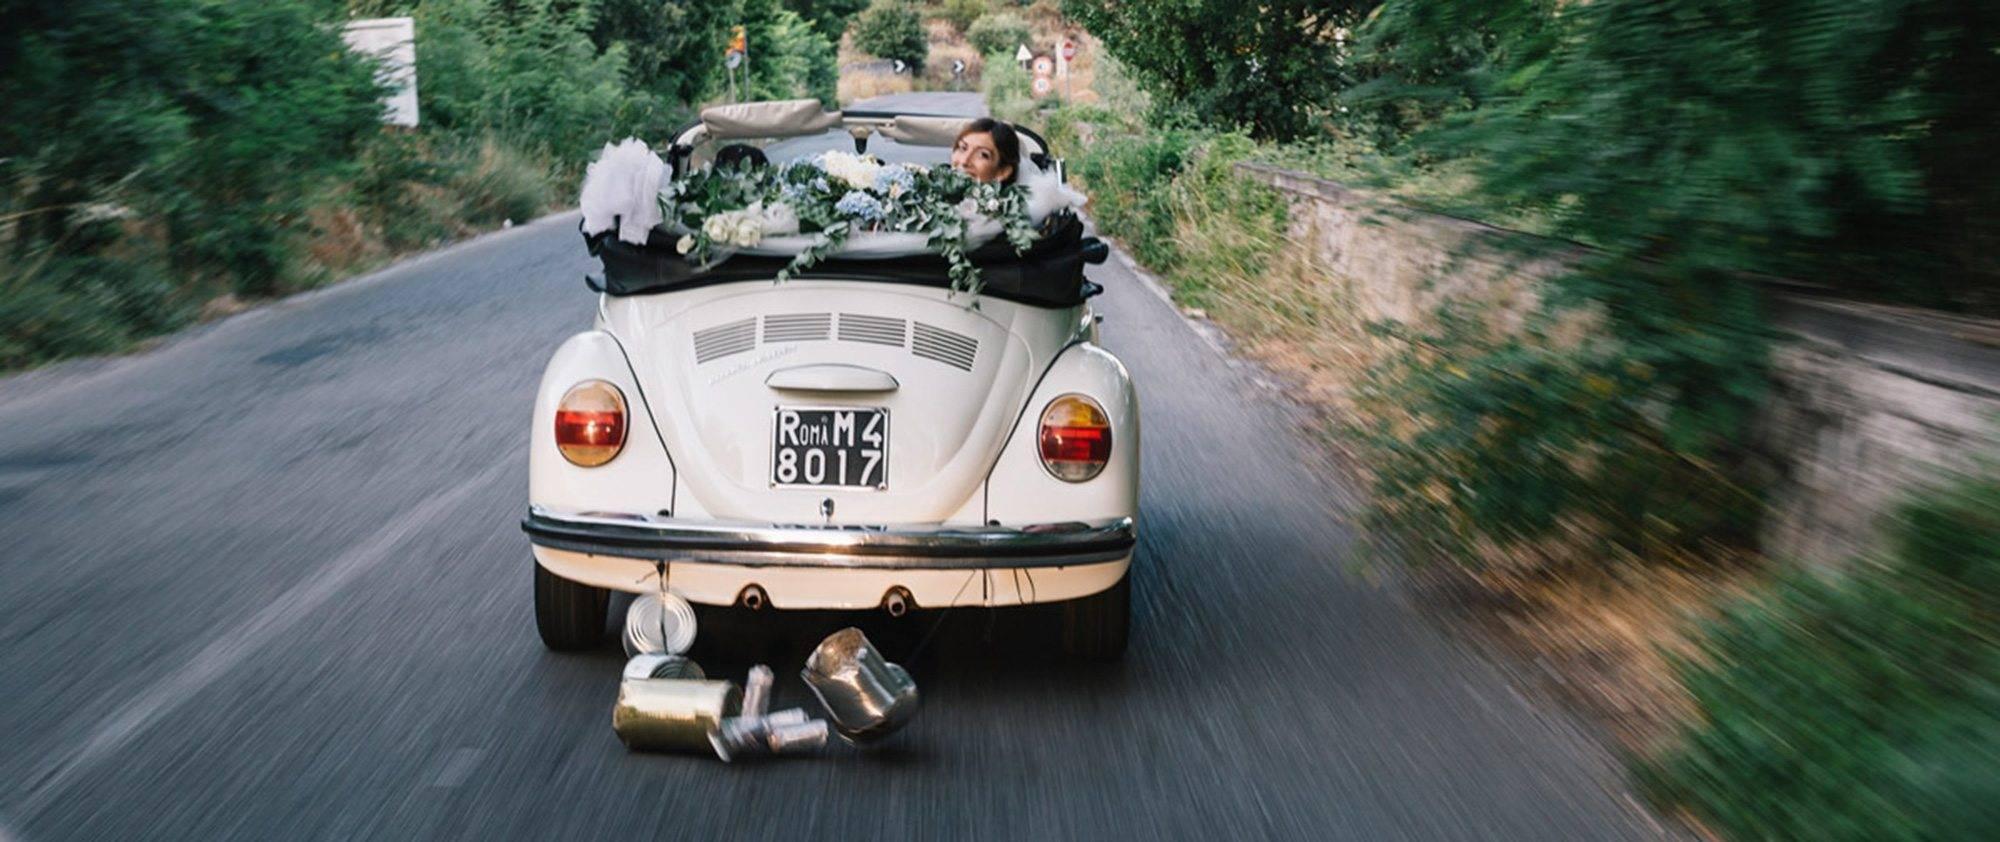 wedding car love sud italy leader - Spotlight on: Rocco Daniele Photography